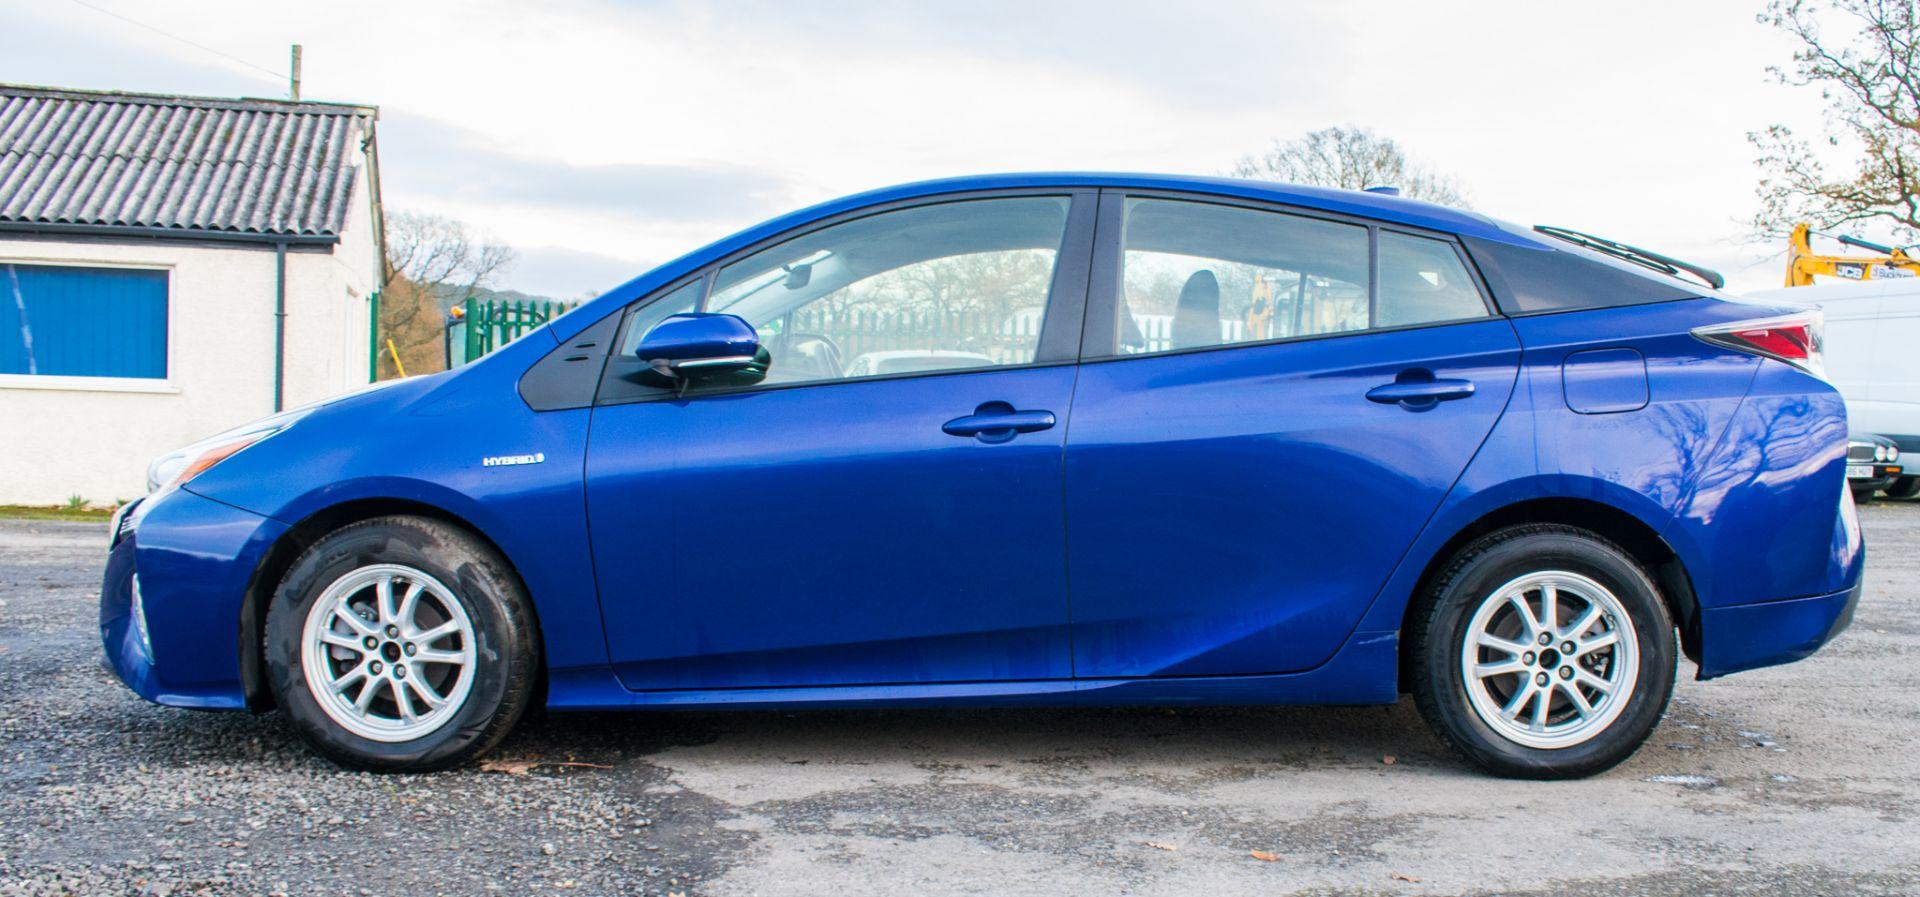 ToyotaPrius ActiveHybrid Electric 5 doorHatchback  Registration Number: LM67 OKH Date of First - Image 8 of 17